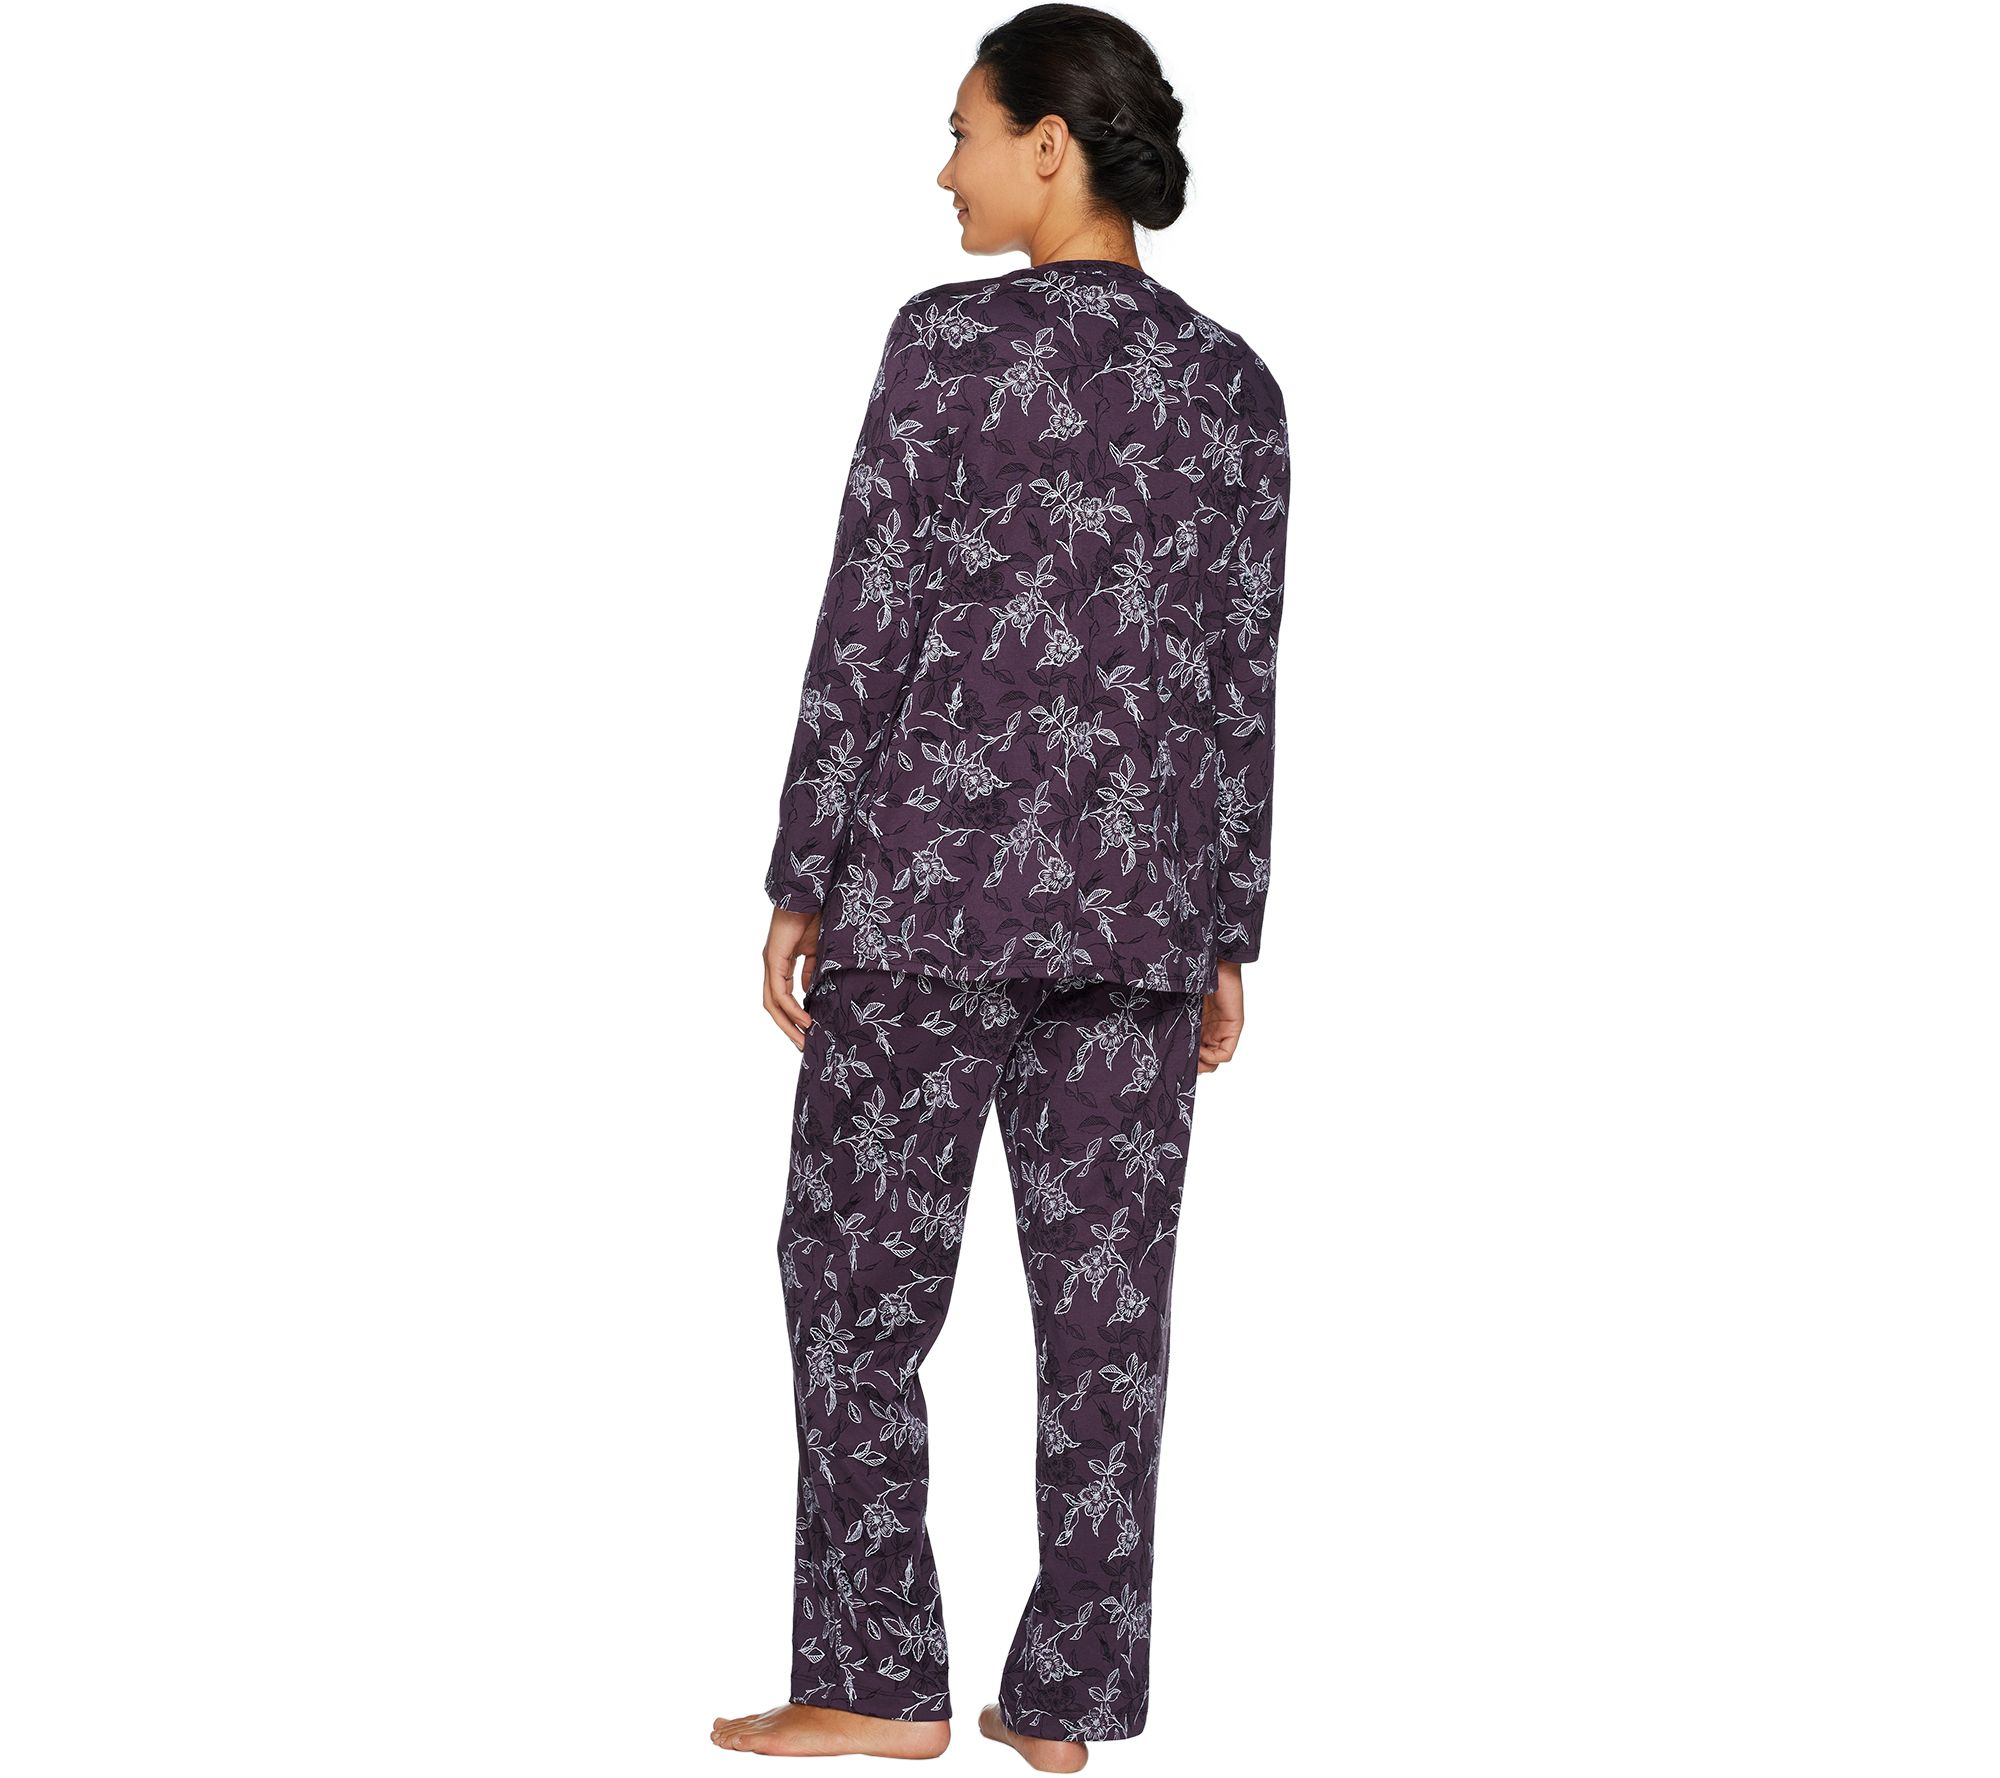 Carole Hochman Interlock Etched Floral 3 Piece Pajama Set Page 1